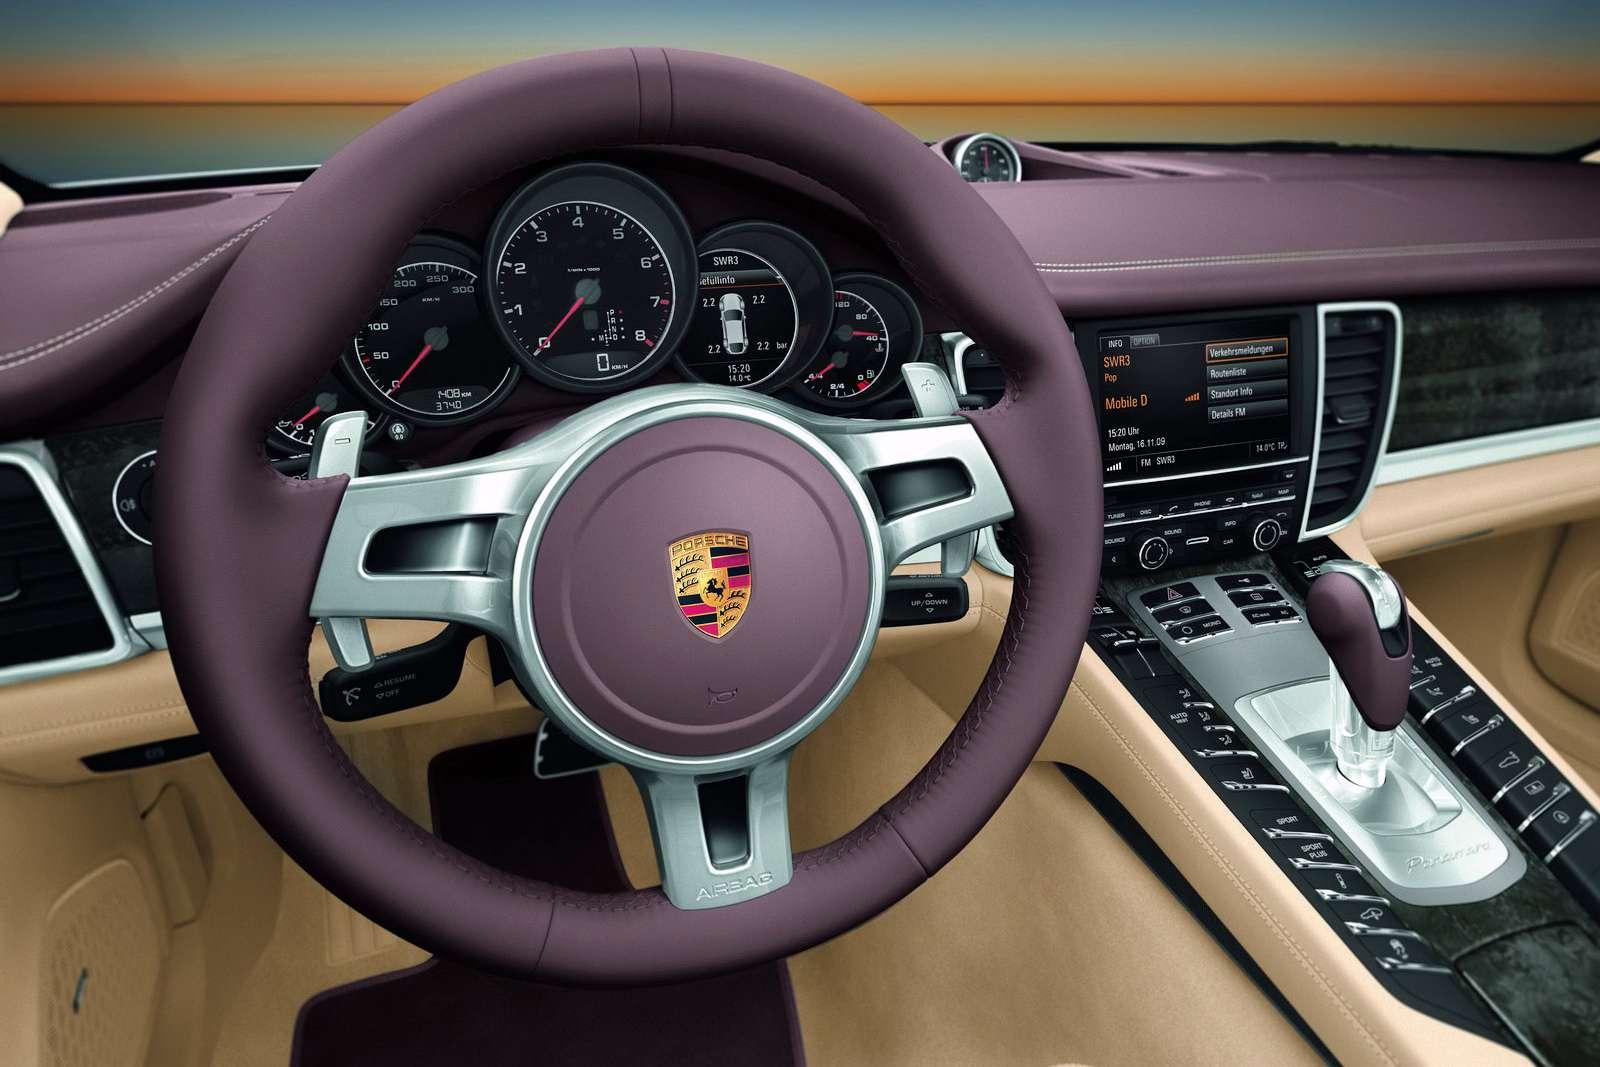 Panamera 300 KM 3.6 V6 fot 2010